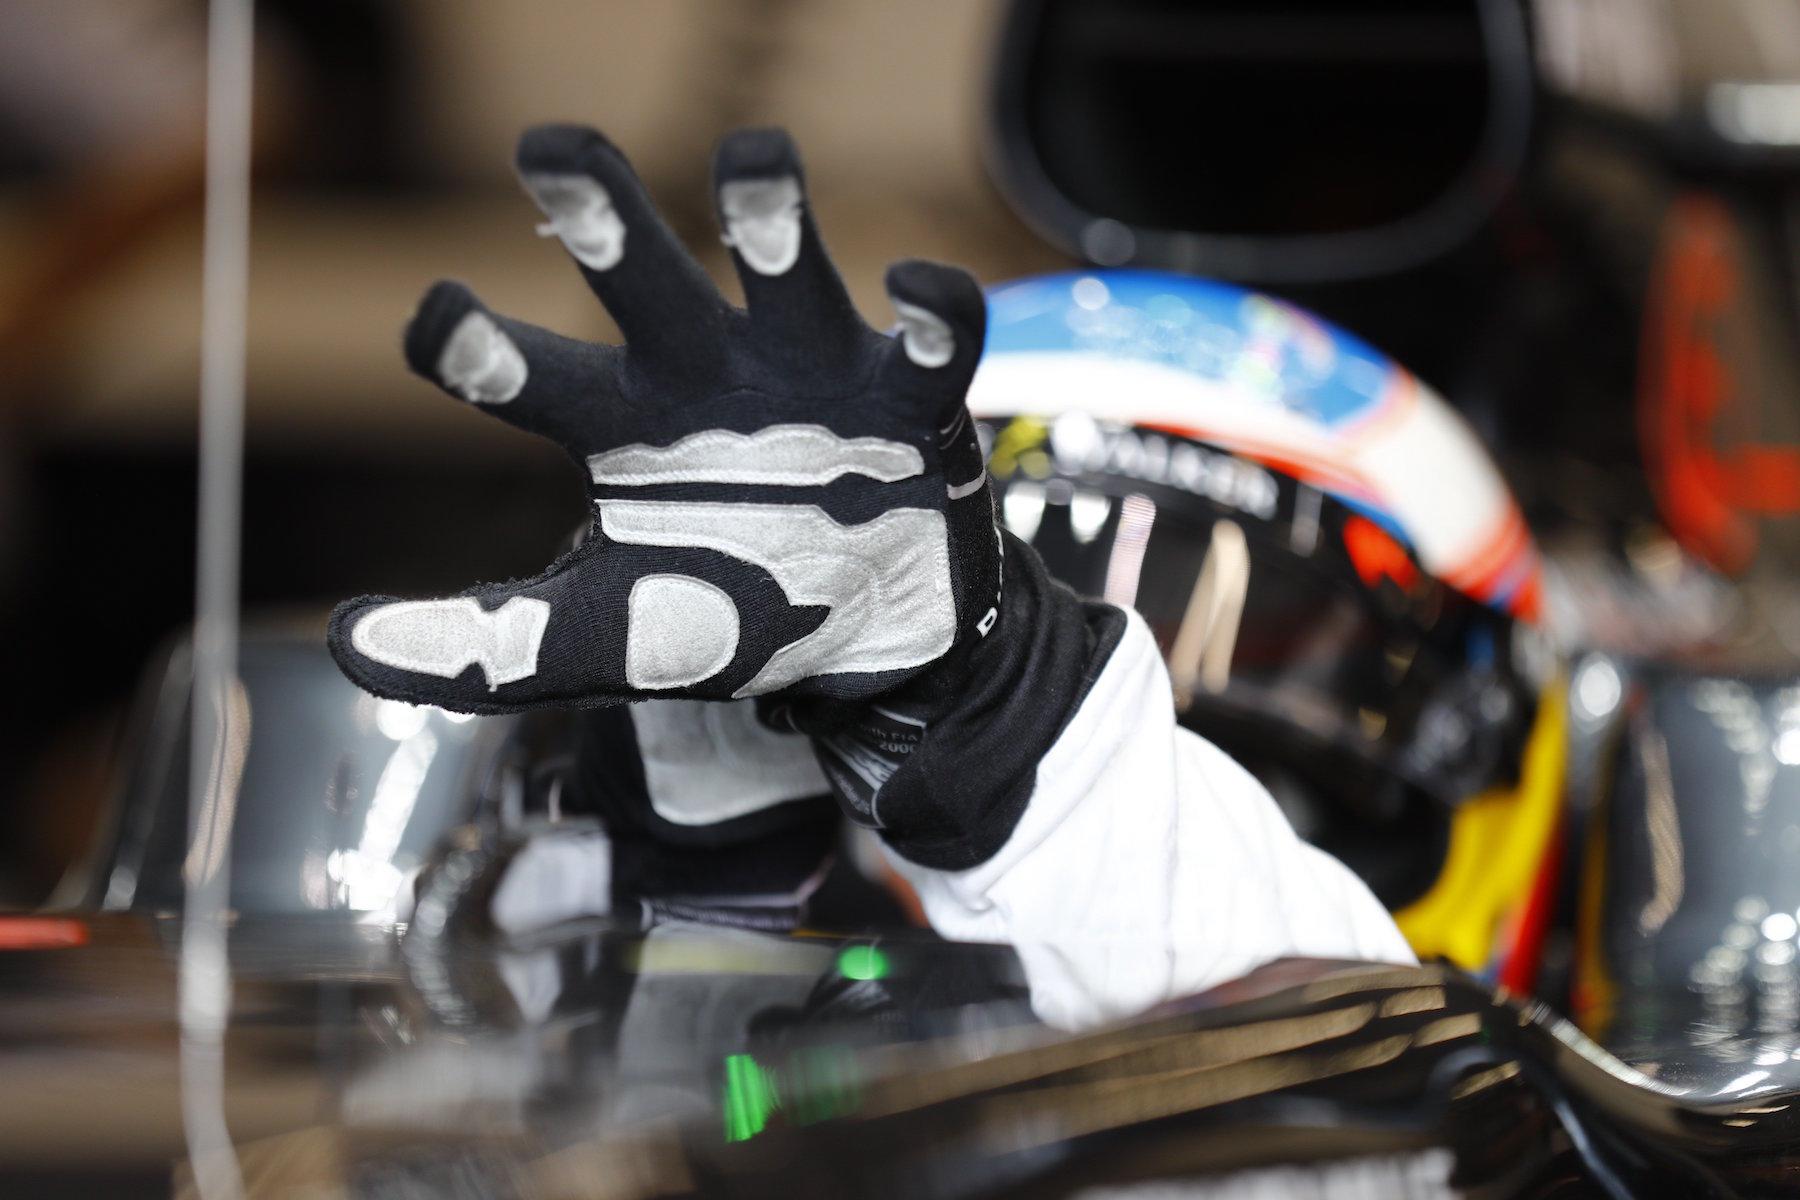 Salracing - Fernando Alonso | McLaren MP4-31